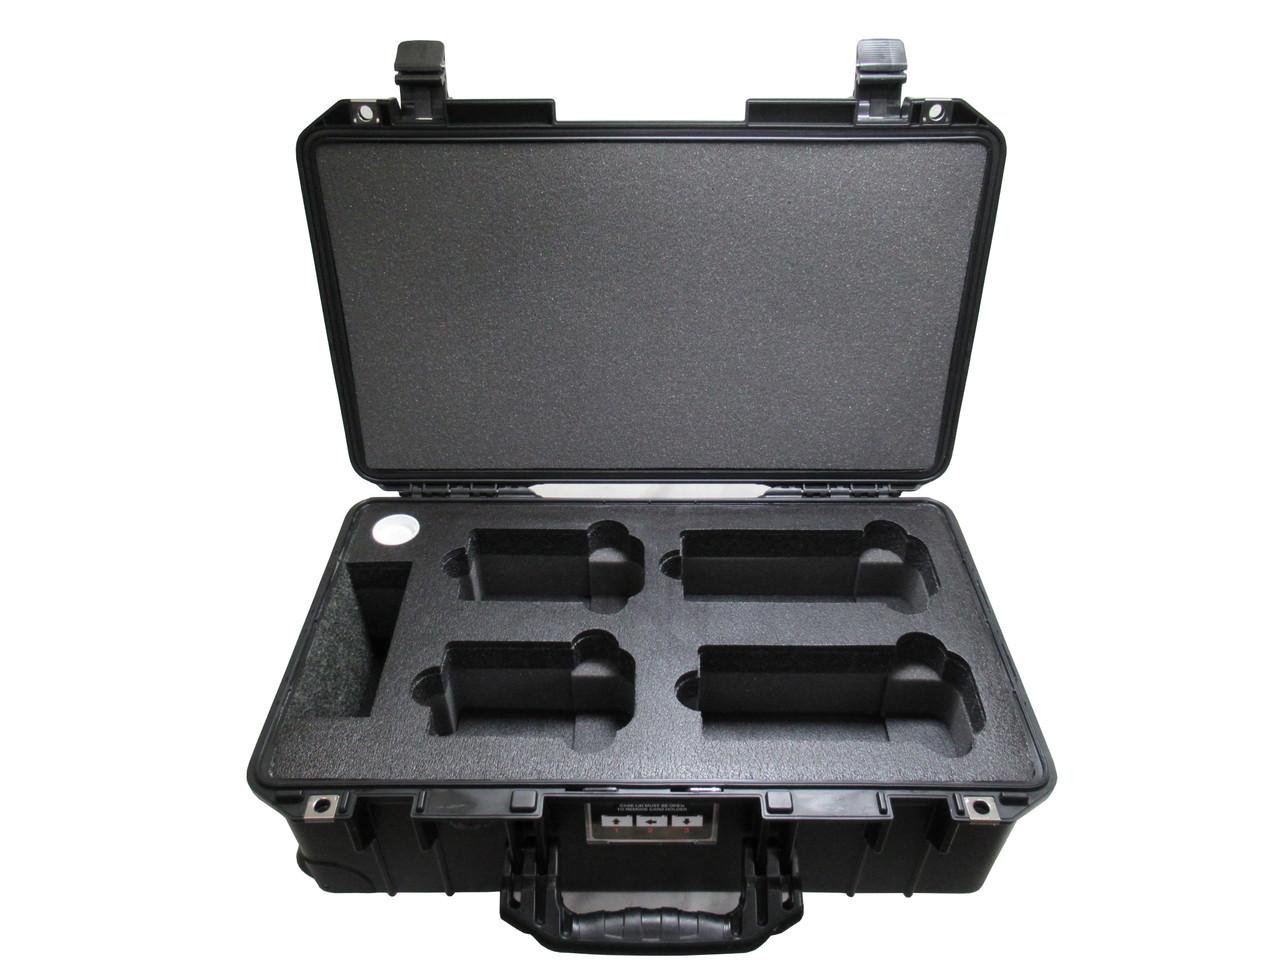 P+S Technik Evolution 2X Anamorphic (40mm, 50mm, 75mm, 100mm)